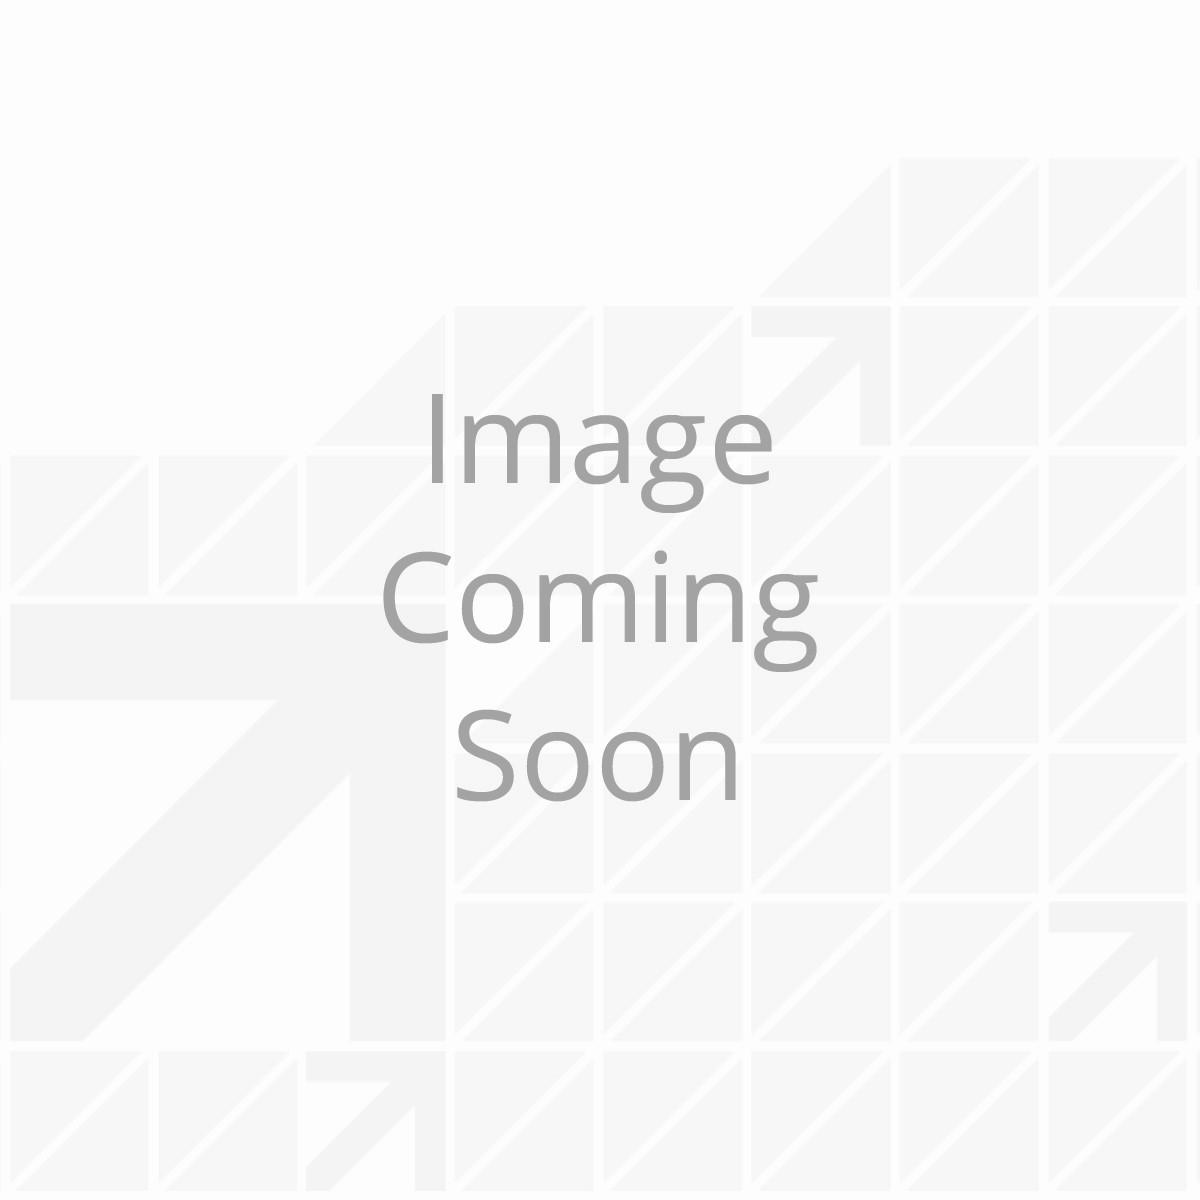 "5"" x 3-3/8"" x 3-3/4"" Watertight Breakaway Battery Case"